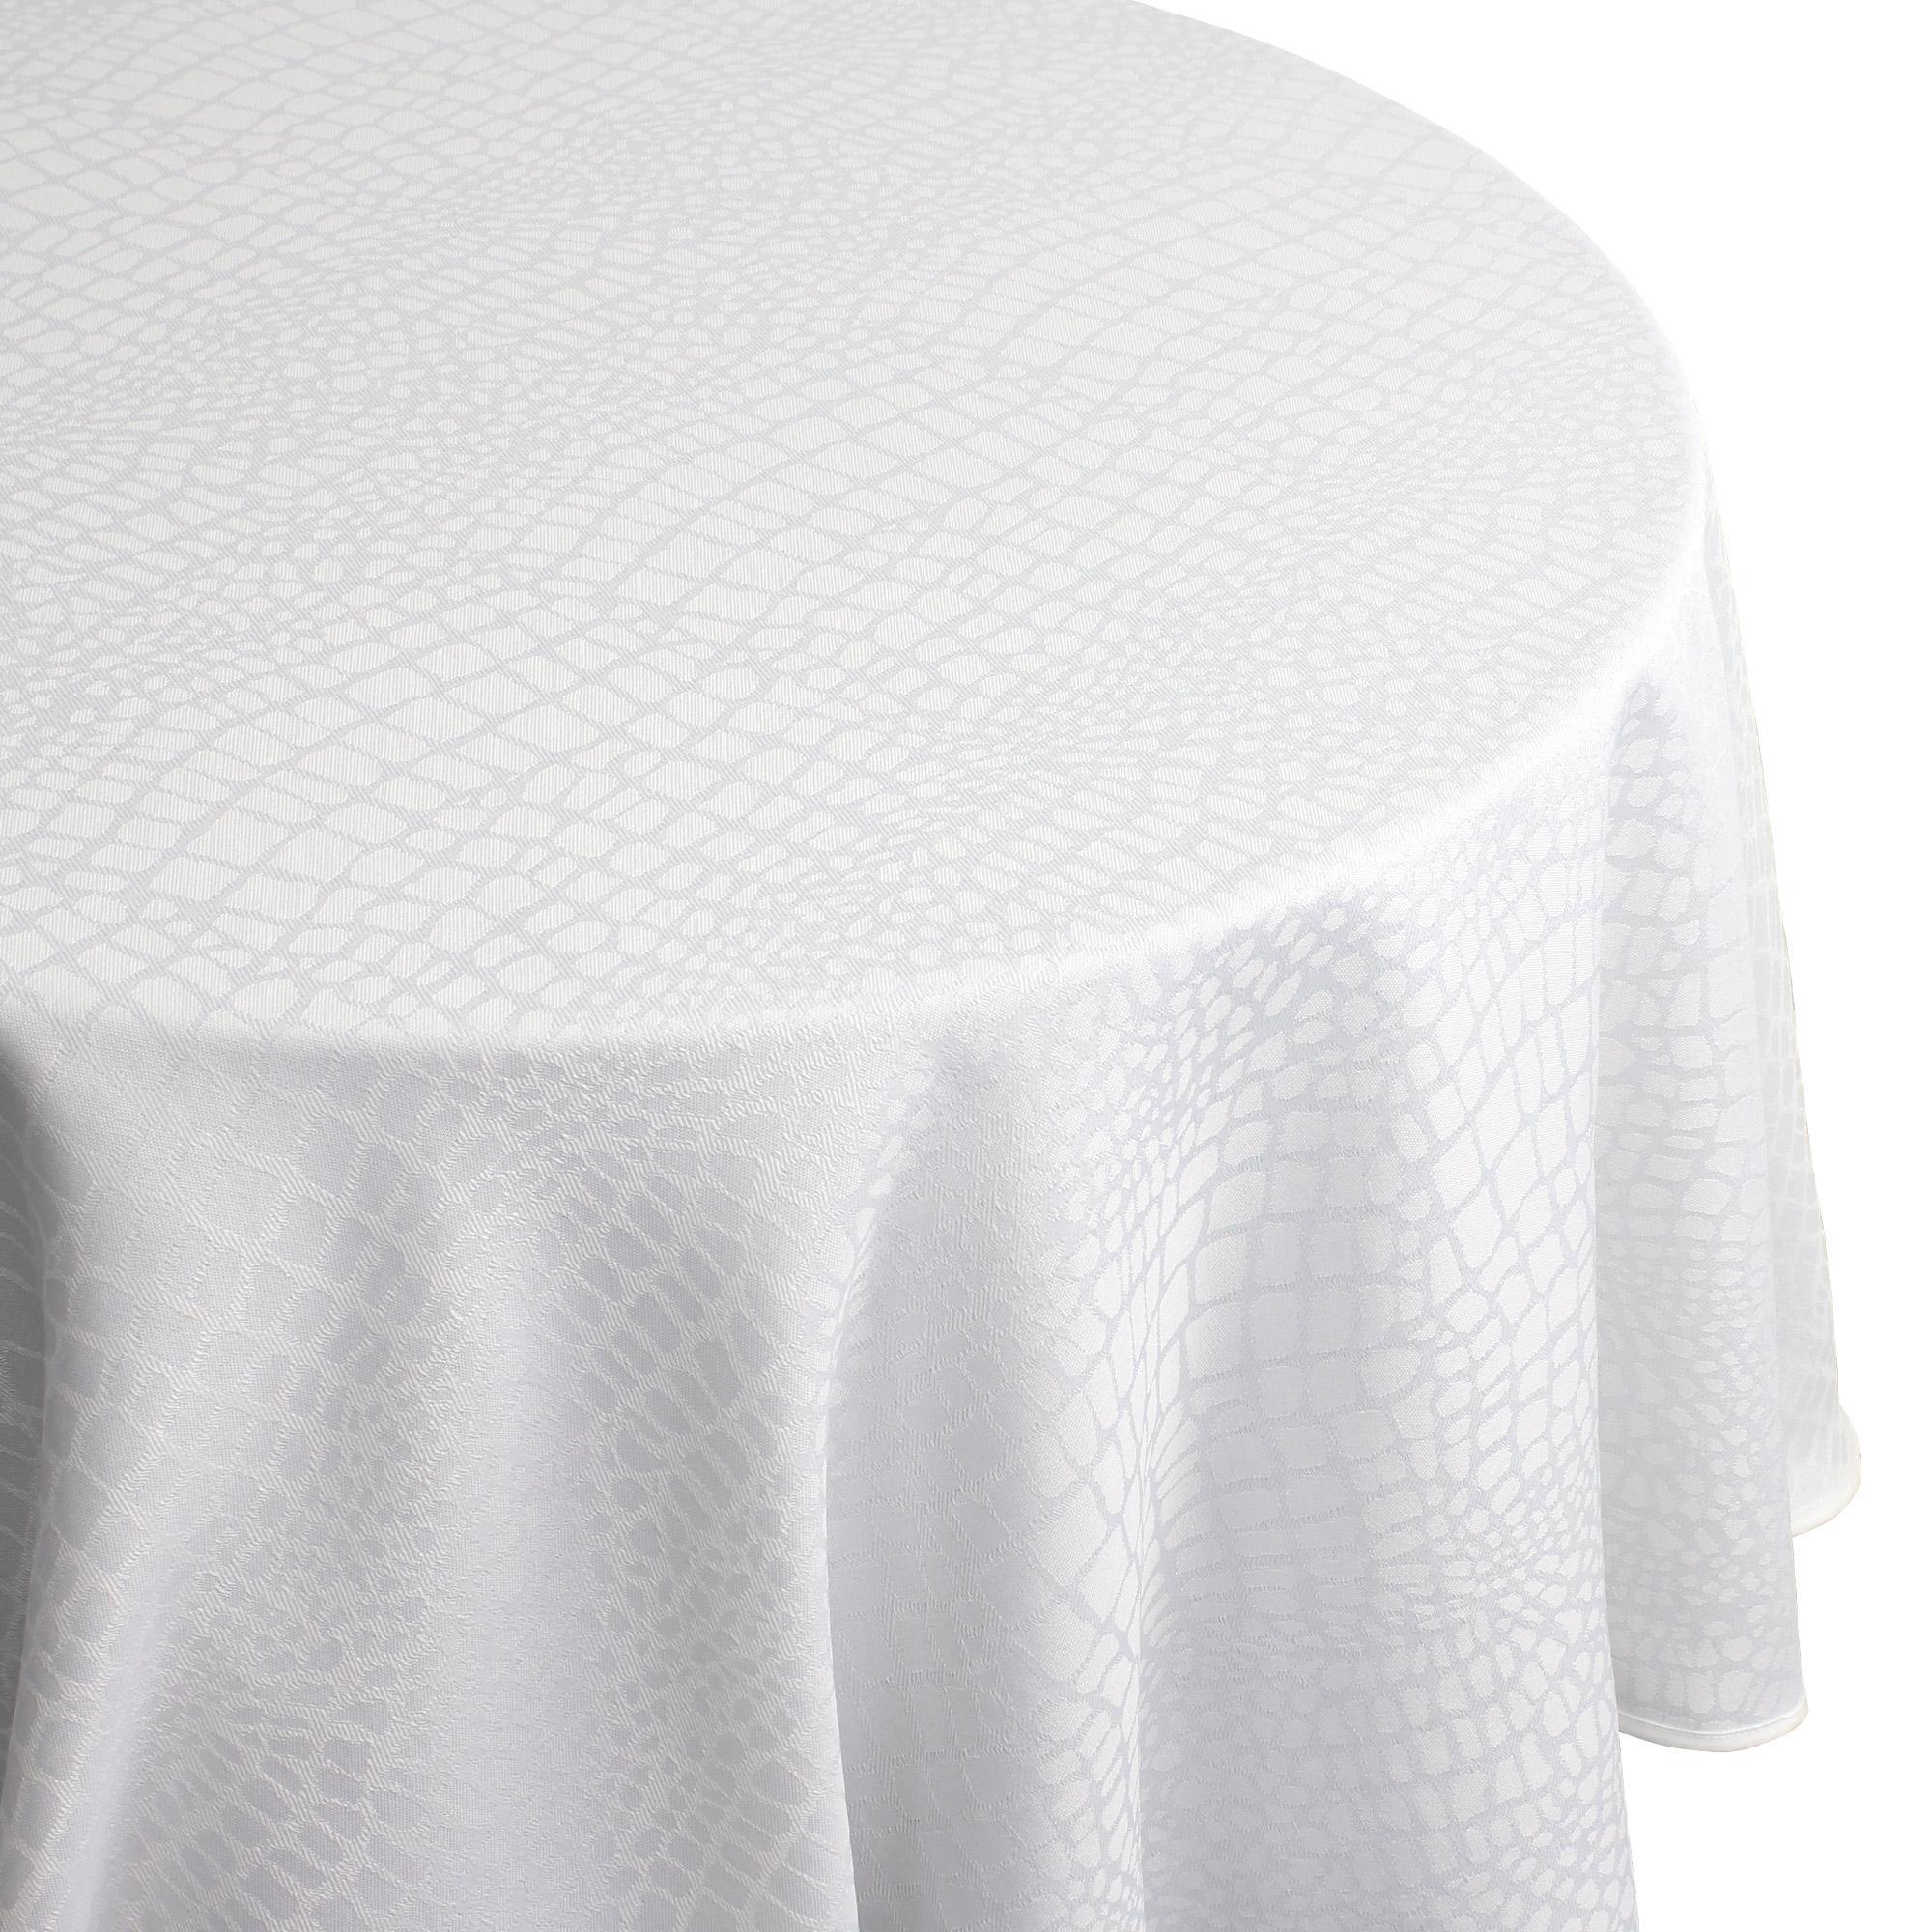 Nappe ronde 6 cm Jacquard 6% polyester LOUNGE blanc